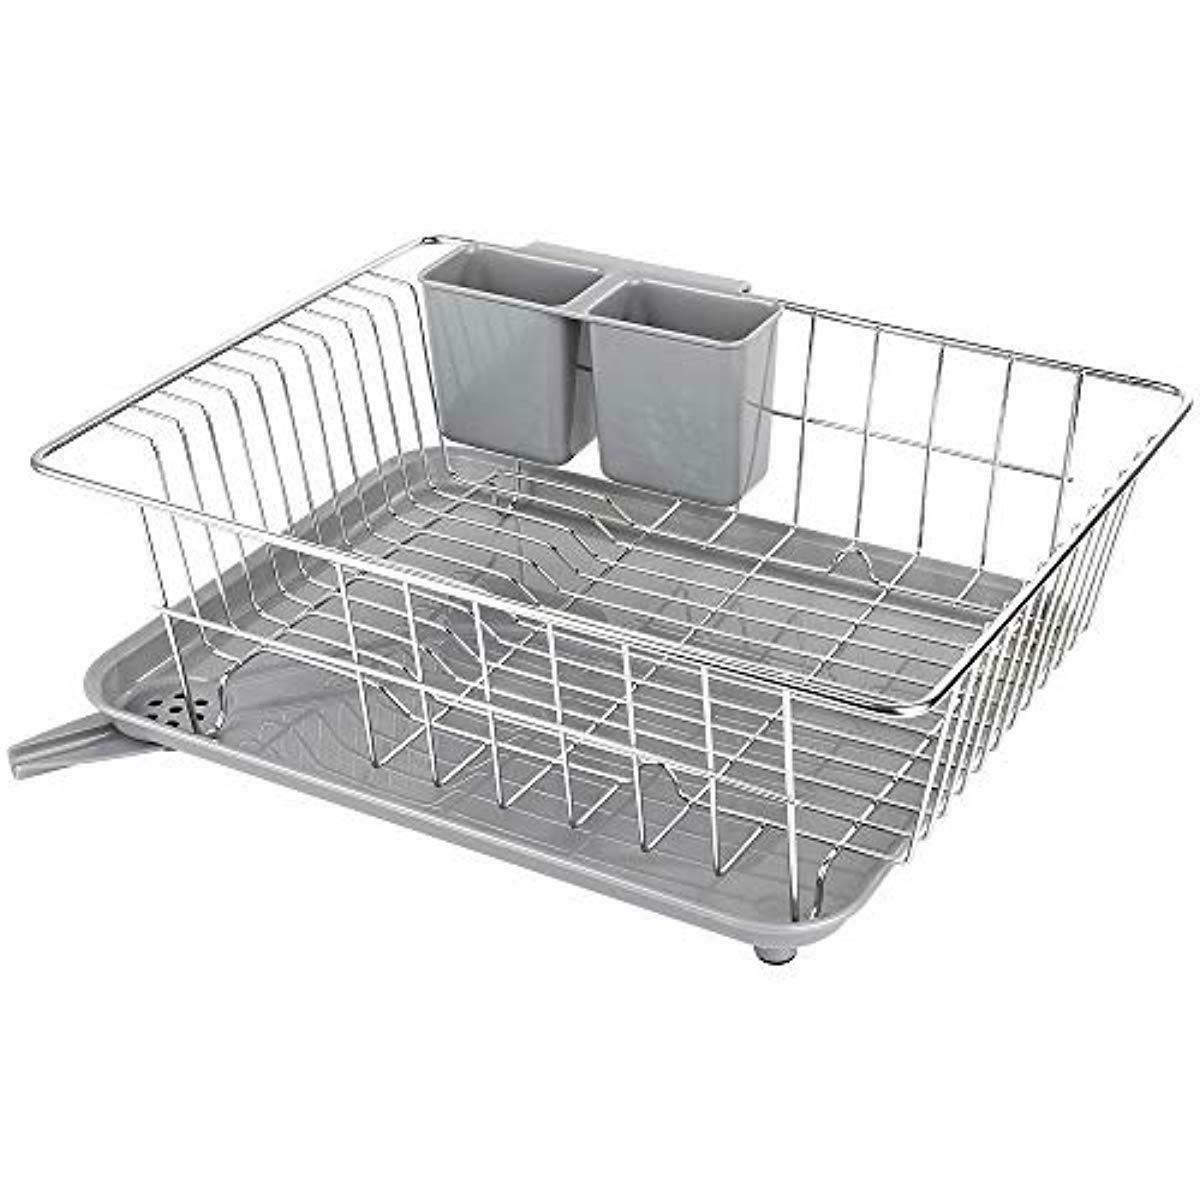 Dish Drying Rack Drain